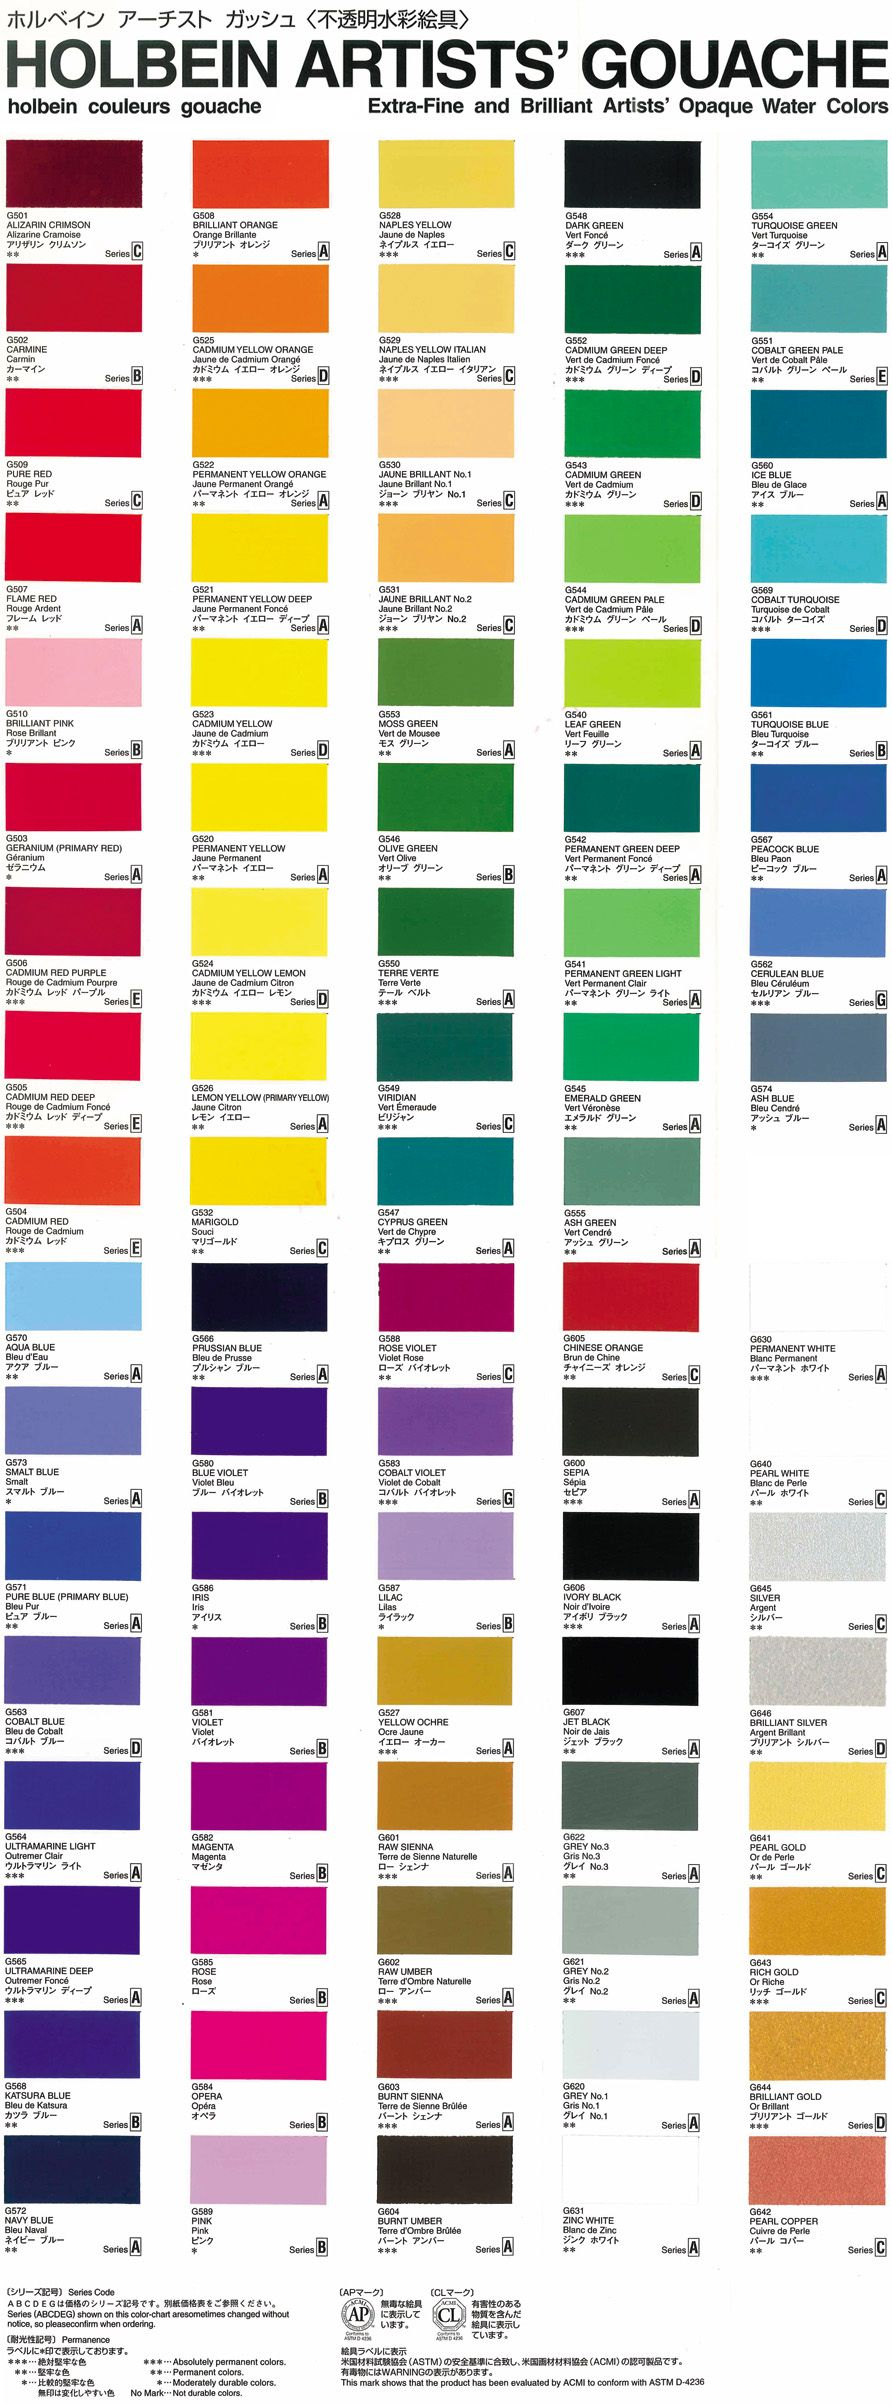 Holbein Gouache Designer Chart Recherche Google Coloured Pencils